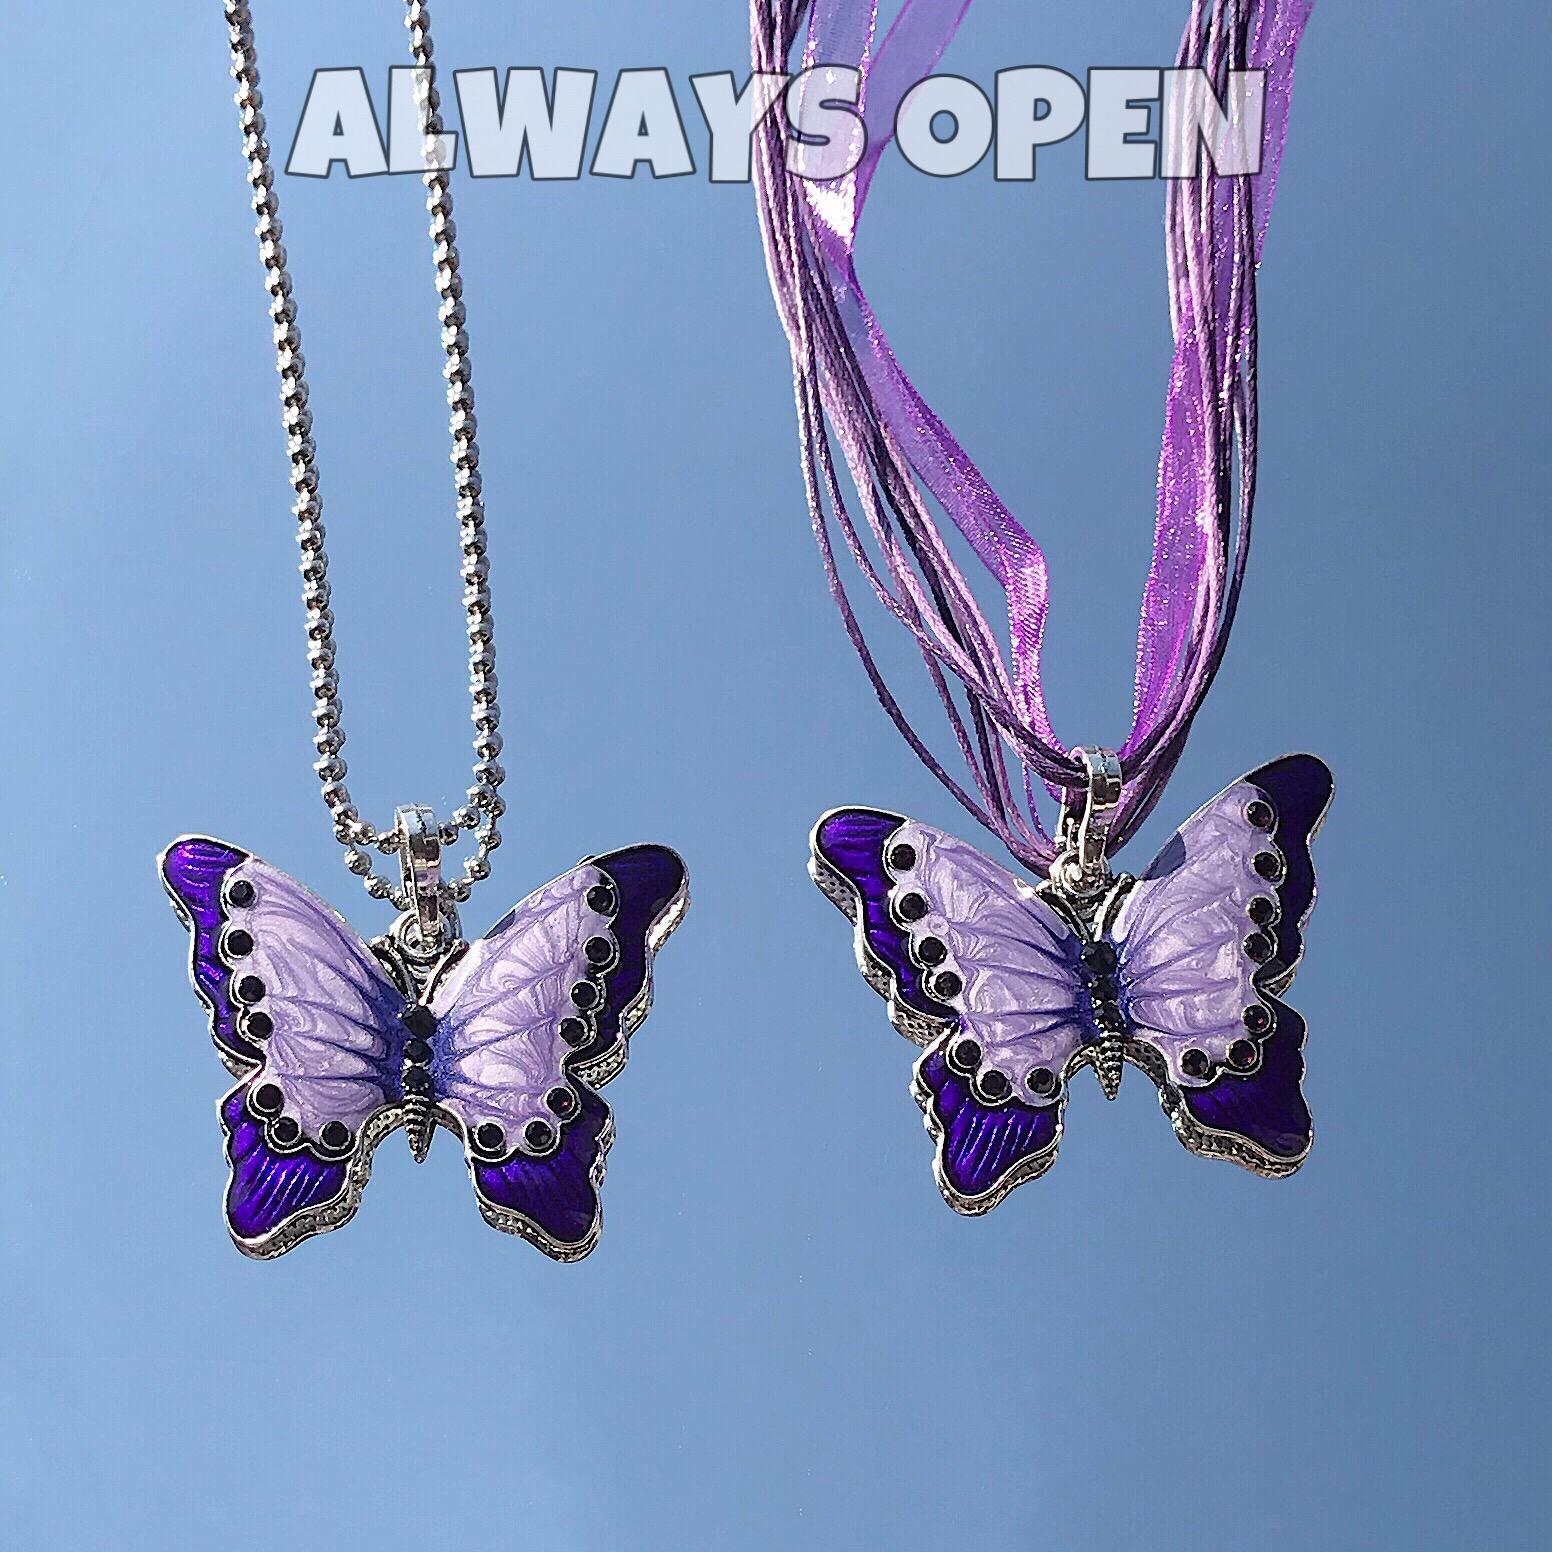 ALWAYS OPEN 手作超美复古点钻金粉紫蝴蝶美丁同款土酷少女项链